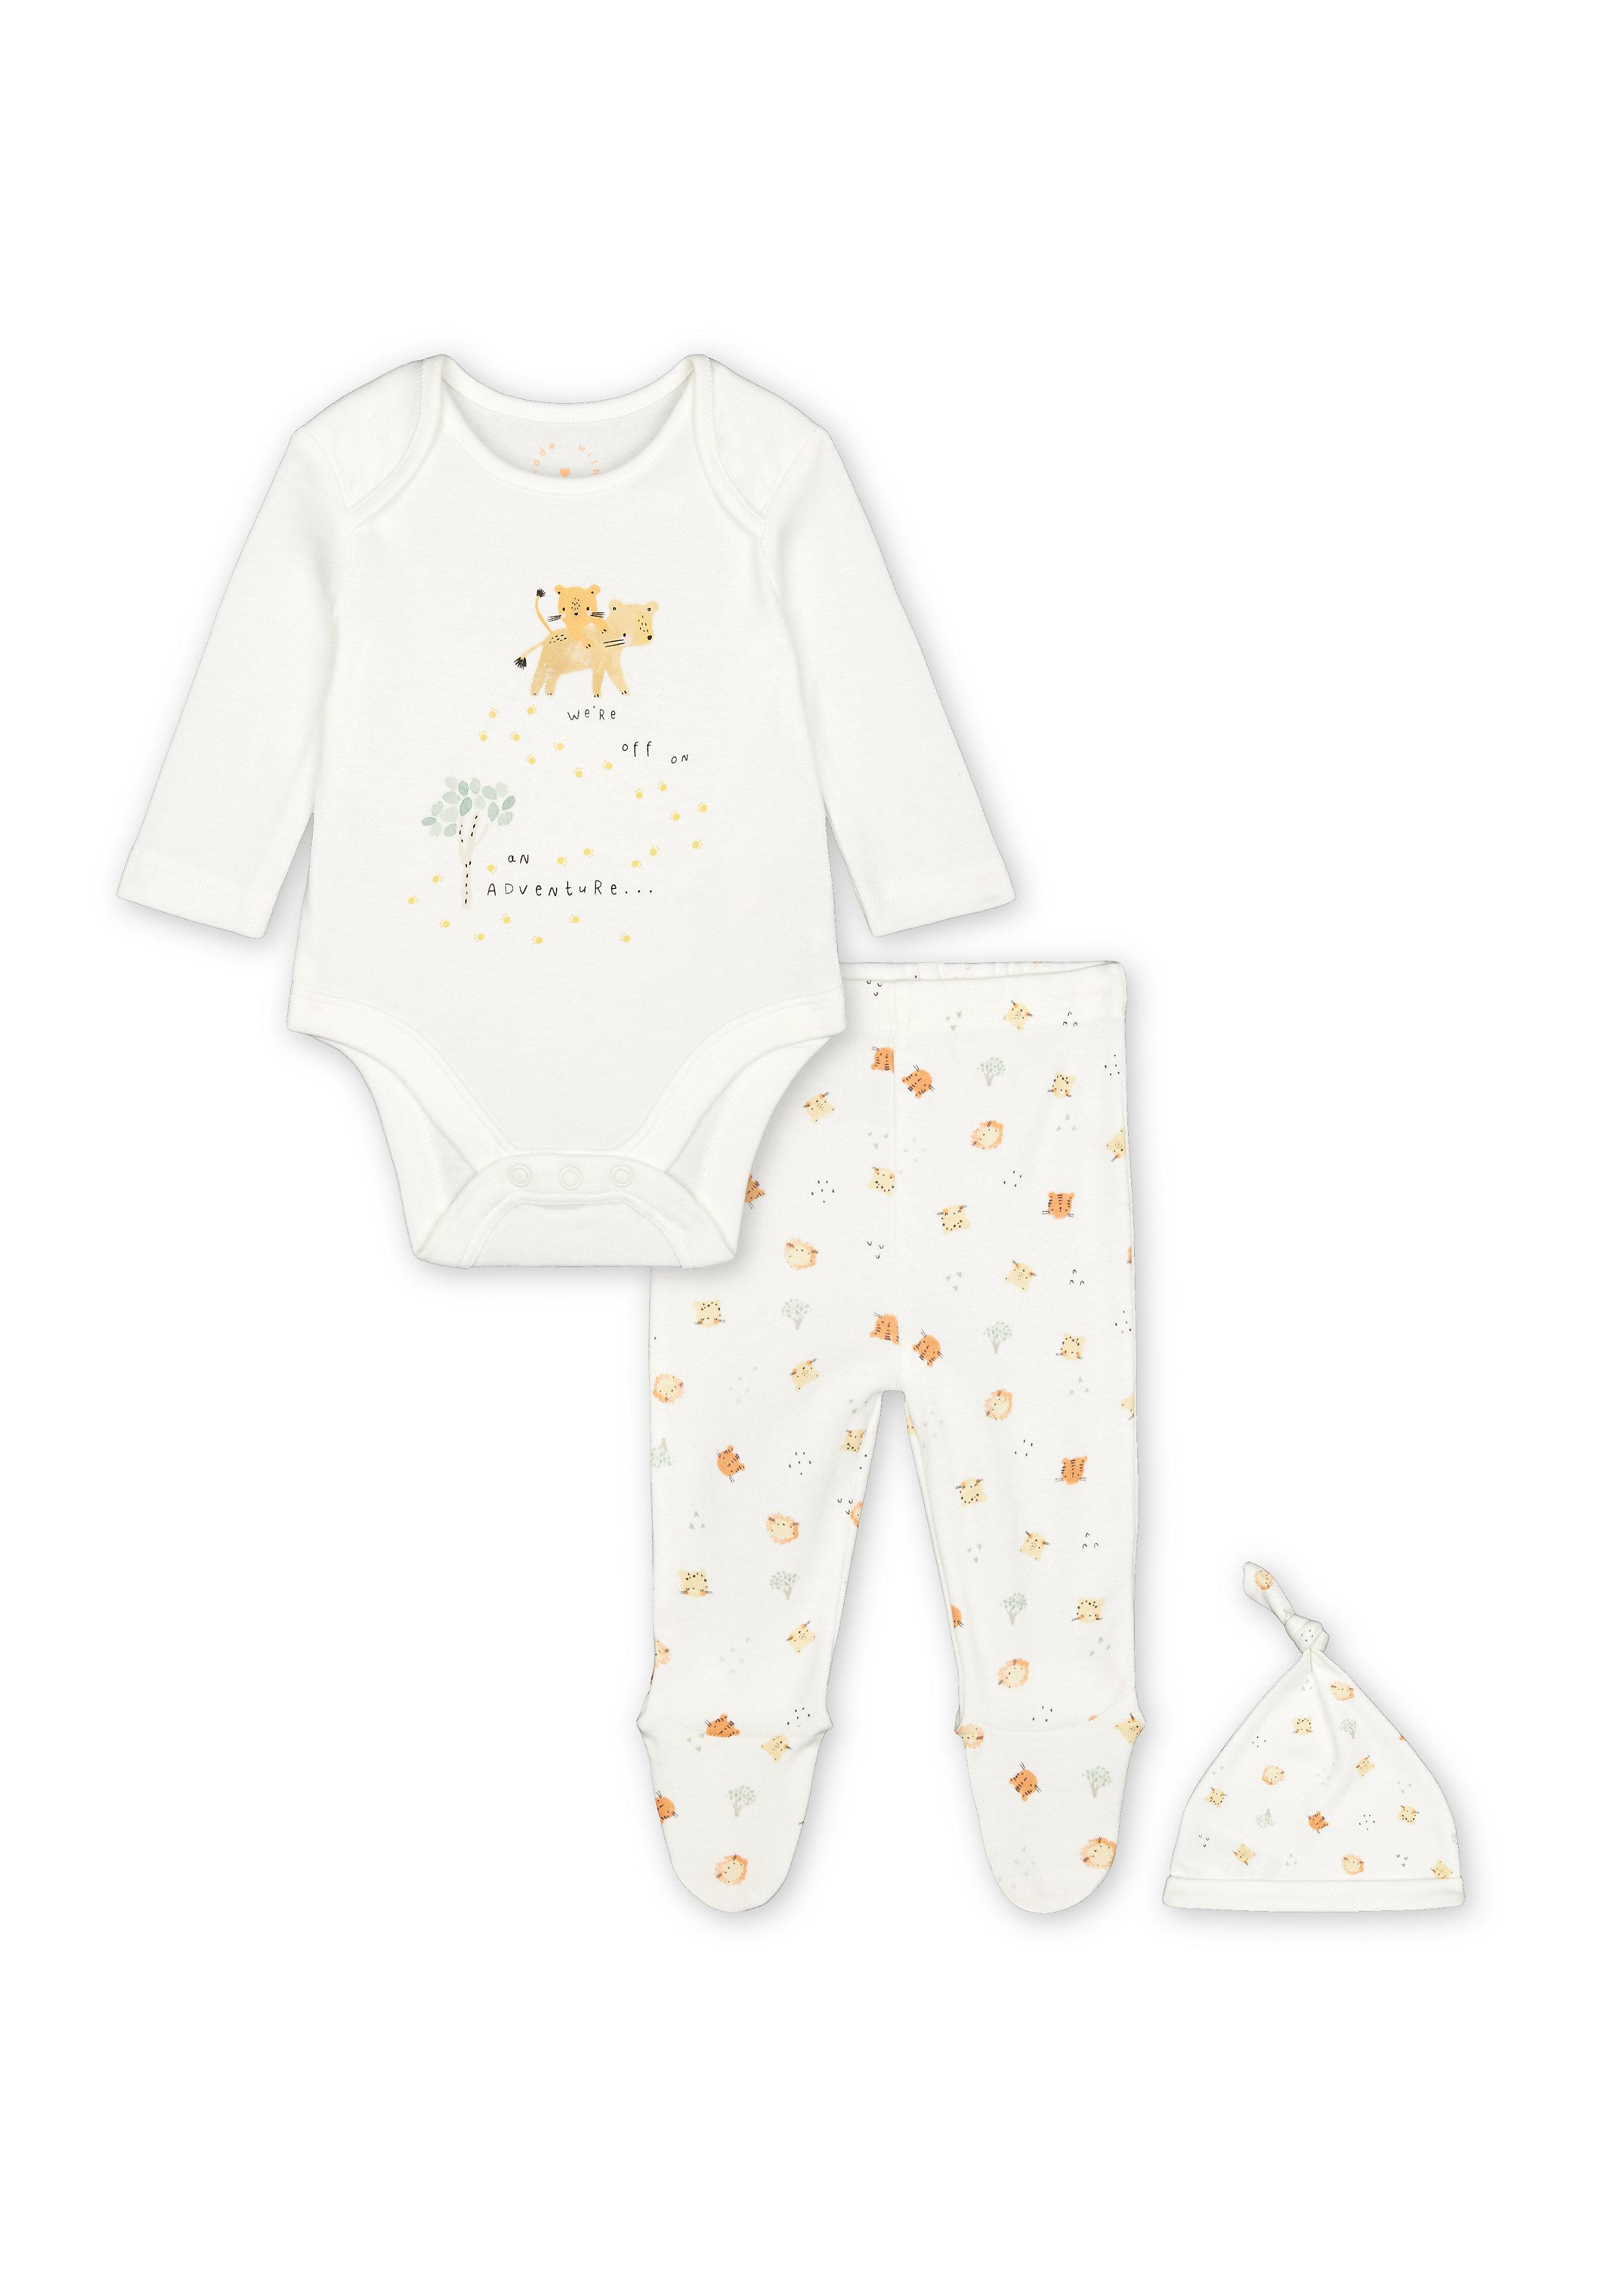 Mothercare | Unisex Full Sleeves 3 Piece Set Animal Print - Cream